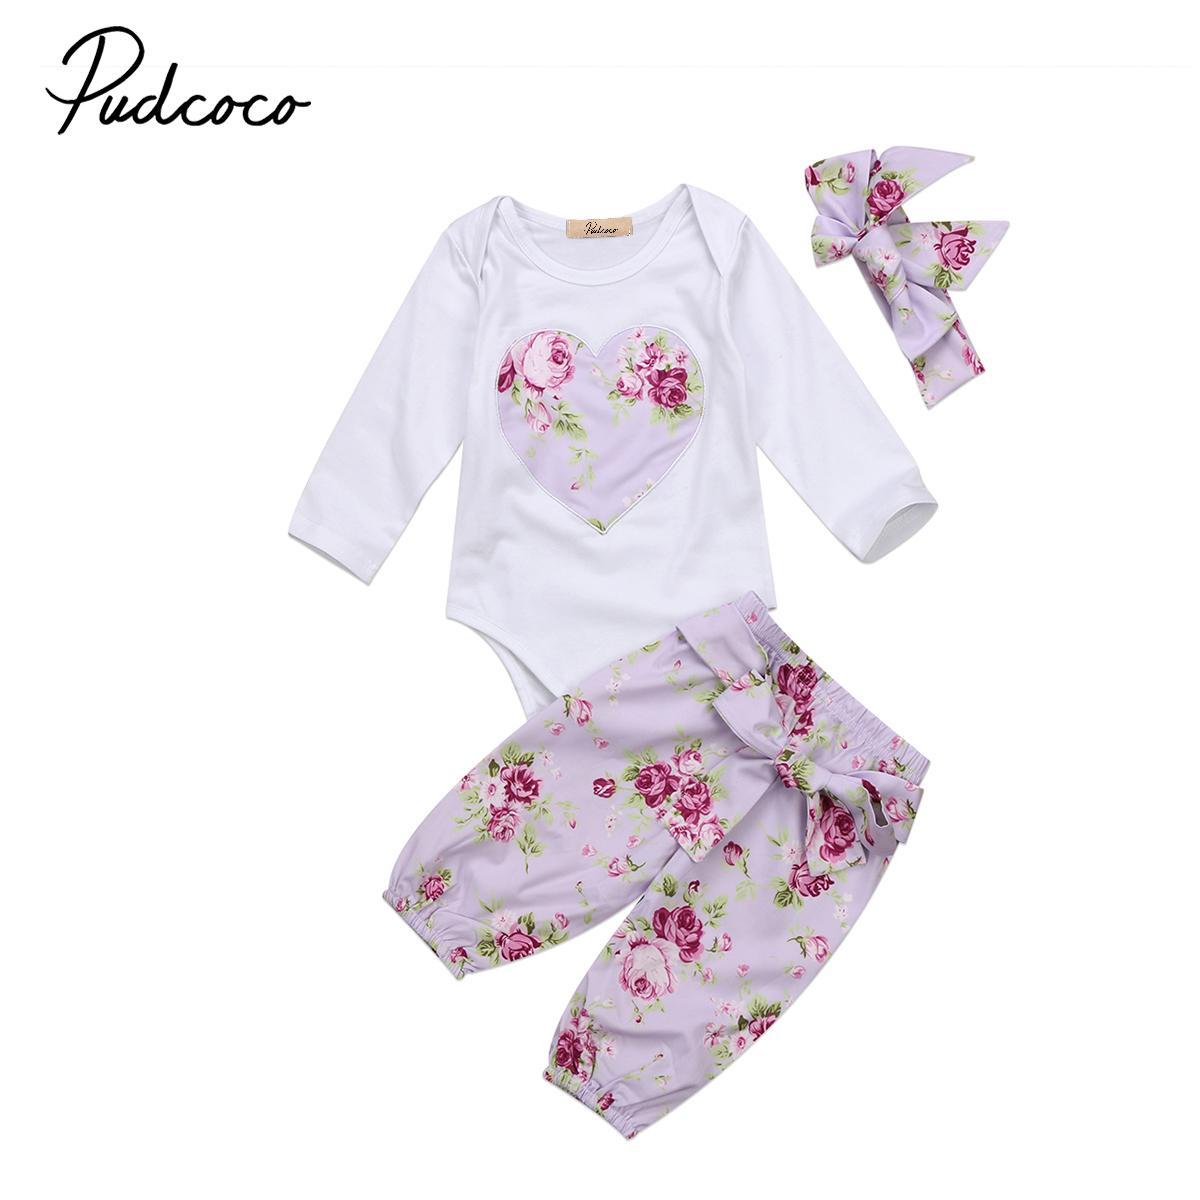 ae9eba5e4 2018 New Floral Romper Set Newborn Baby Girls Clothes Infant Long ...